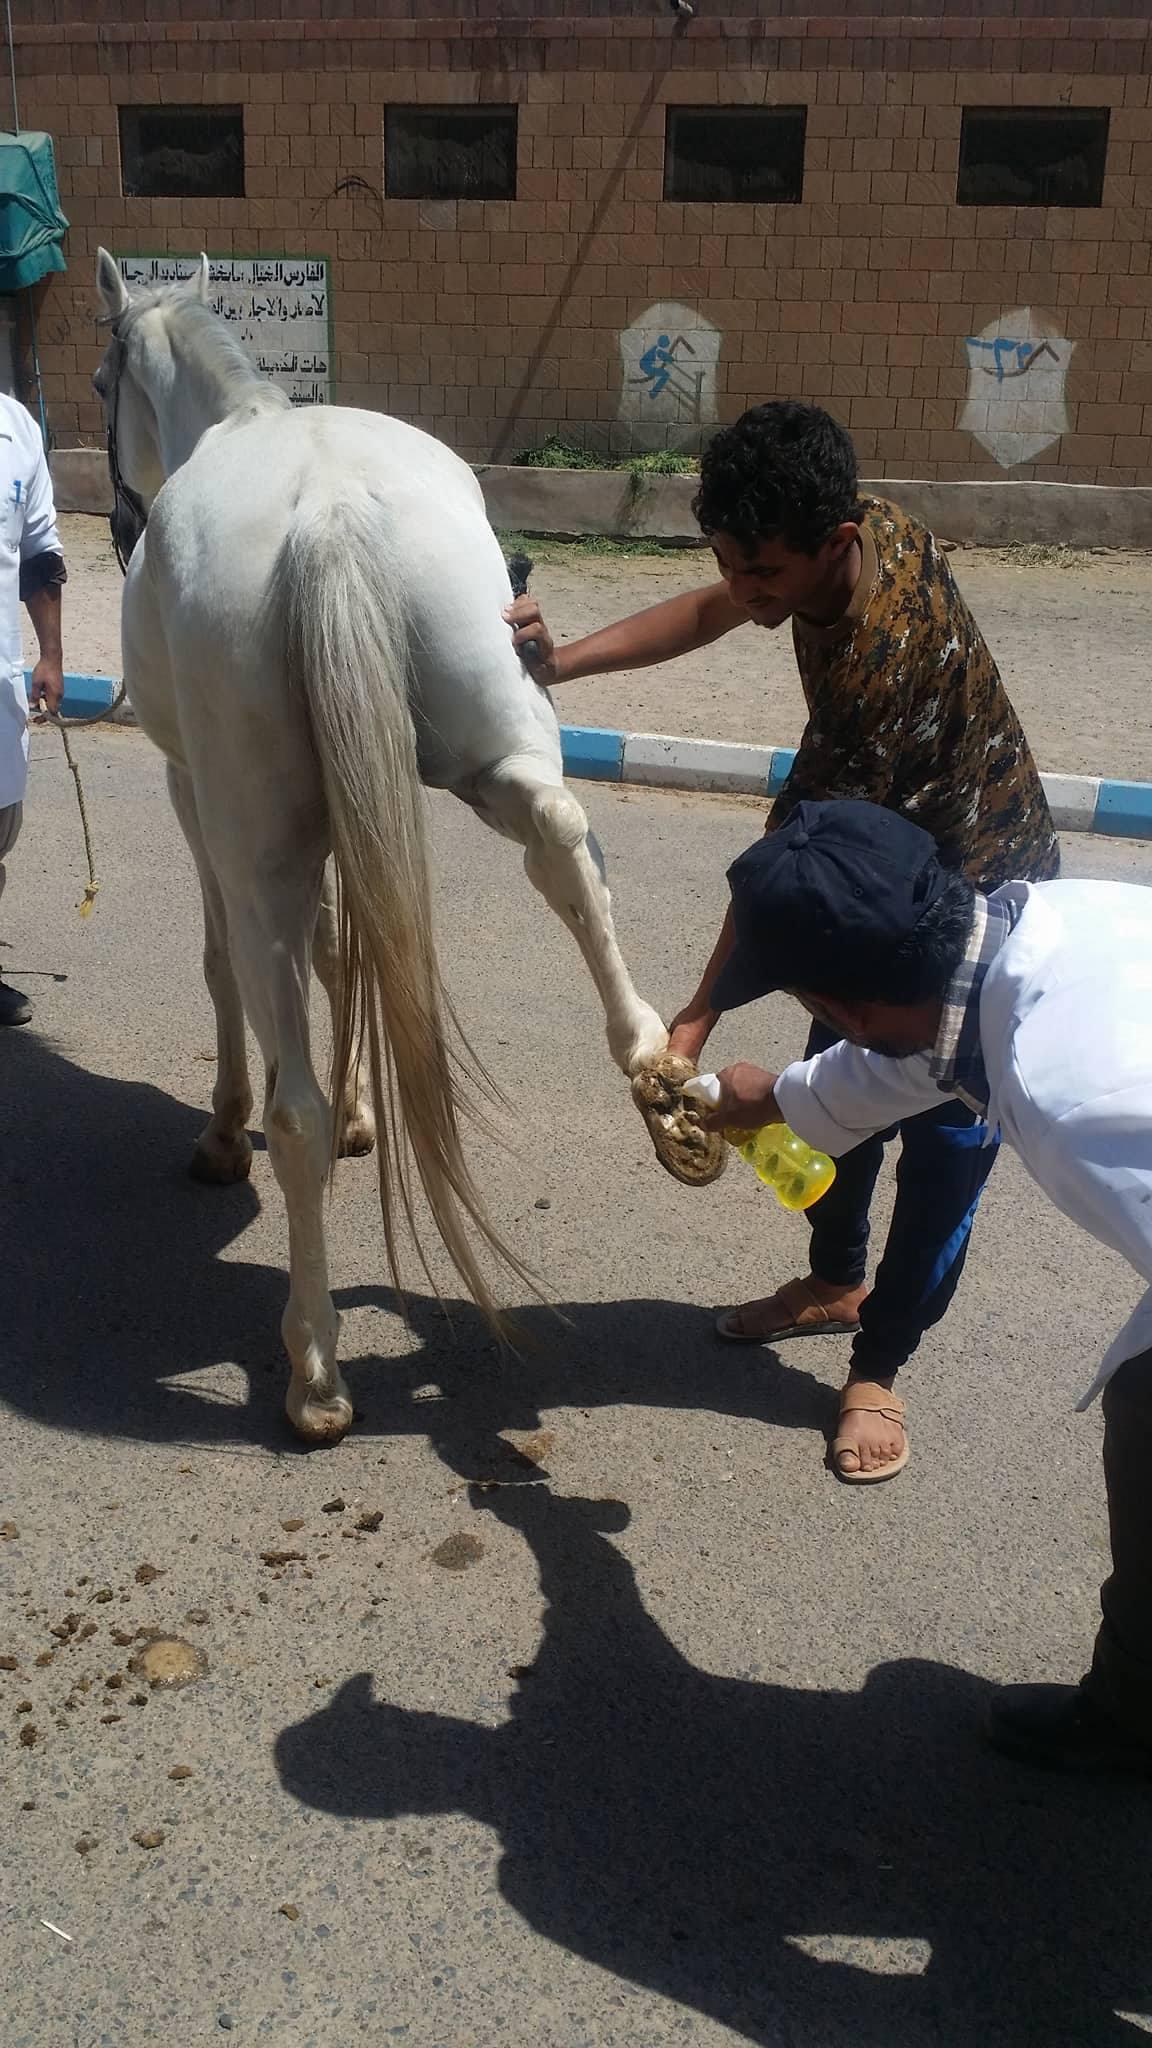 arabian 16 OCT 2017 OWAP AR disinfect hoof Police Academy Yemen Rescue Mission.jpg